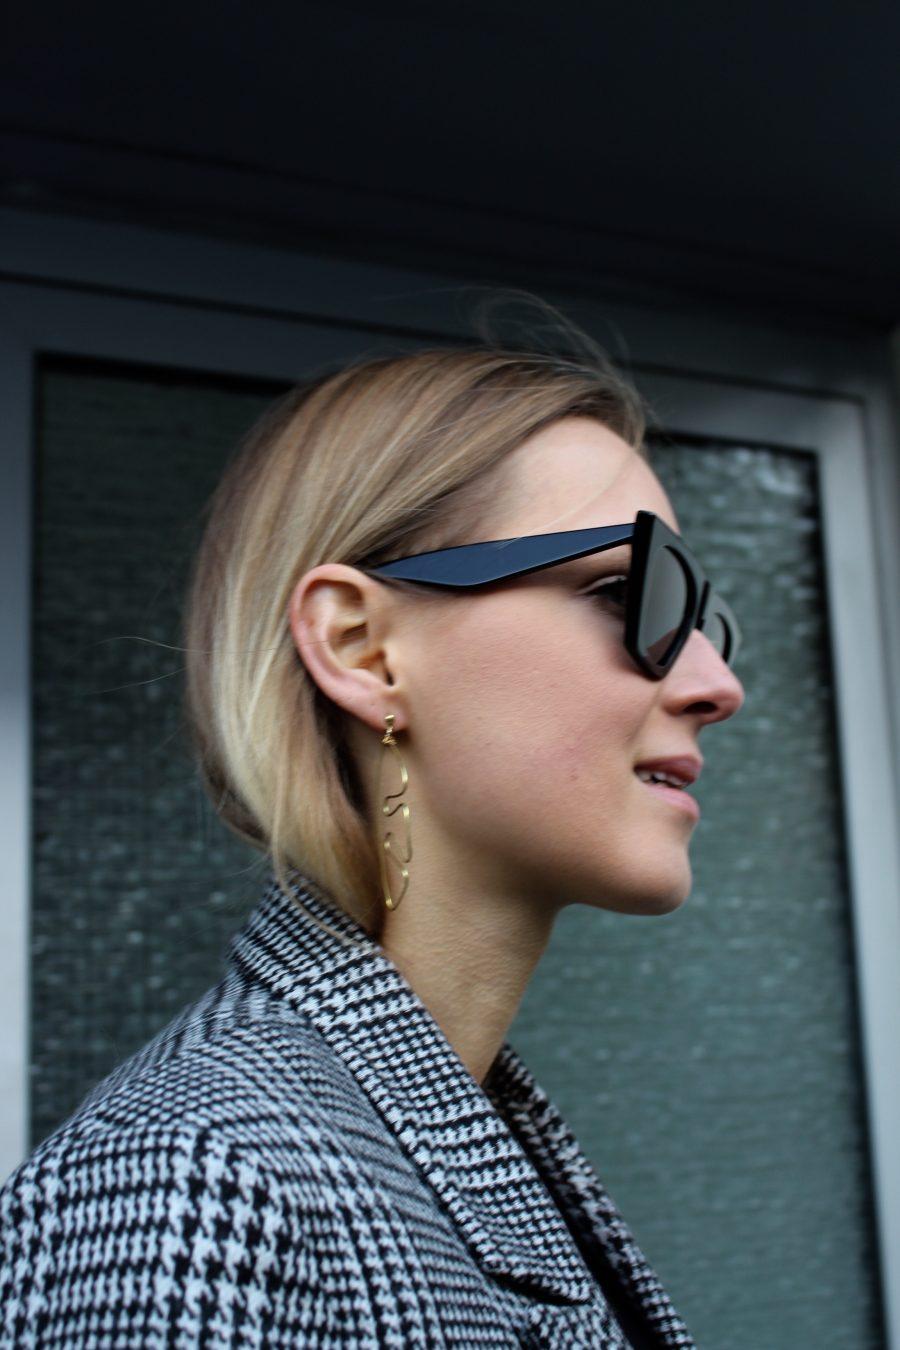 céline sunglasses schwarz edge